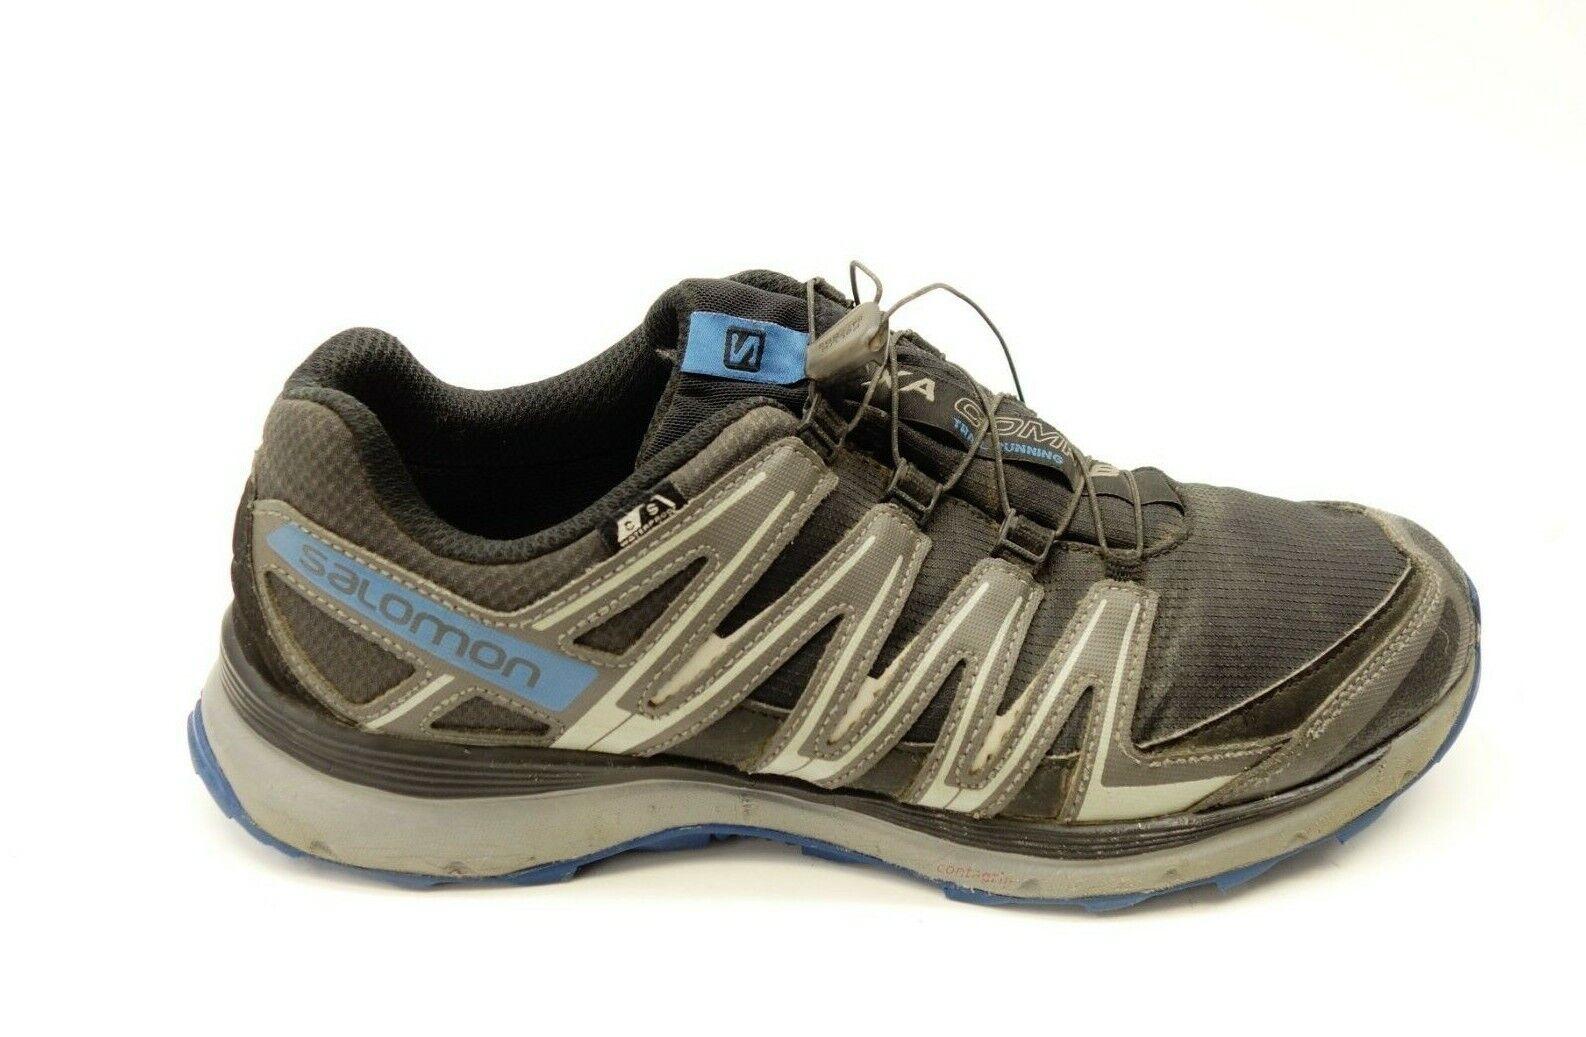 Salomon Mens XA Comp 8 CS Waterproof Outdoor Hiking Trail Running shoes Sz 10.5